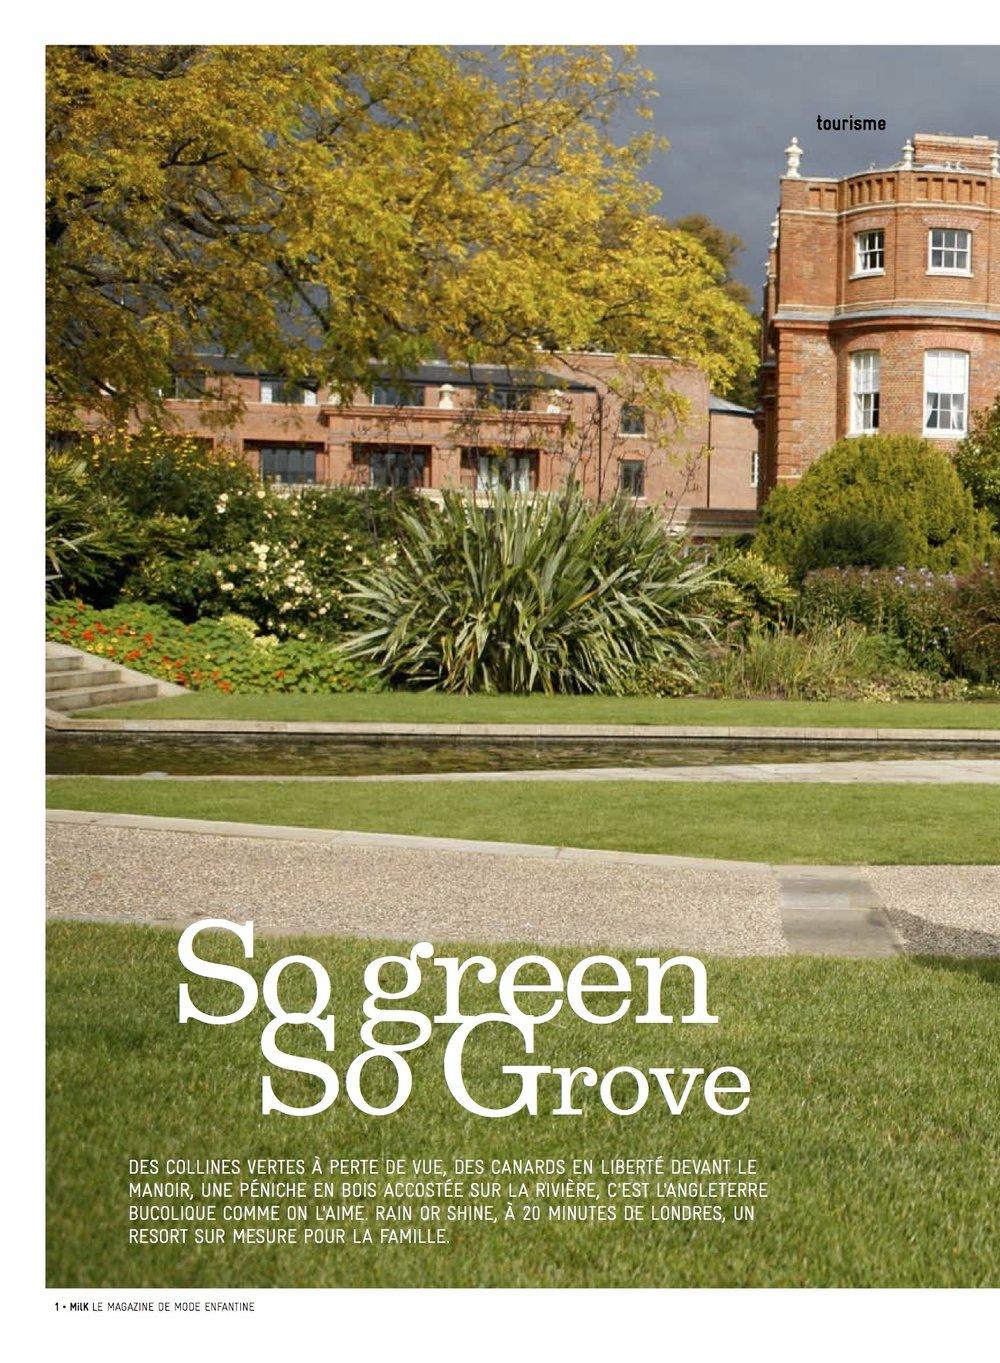 The Grove Hotel, So Green So Grove